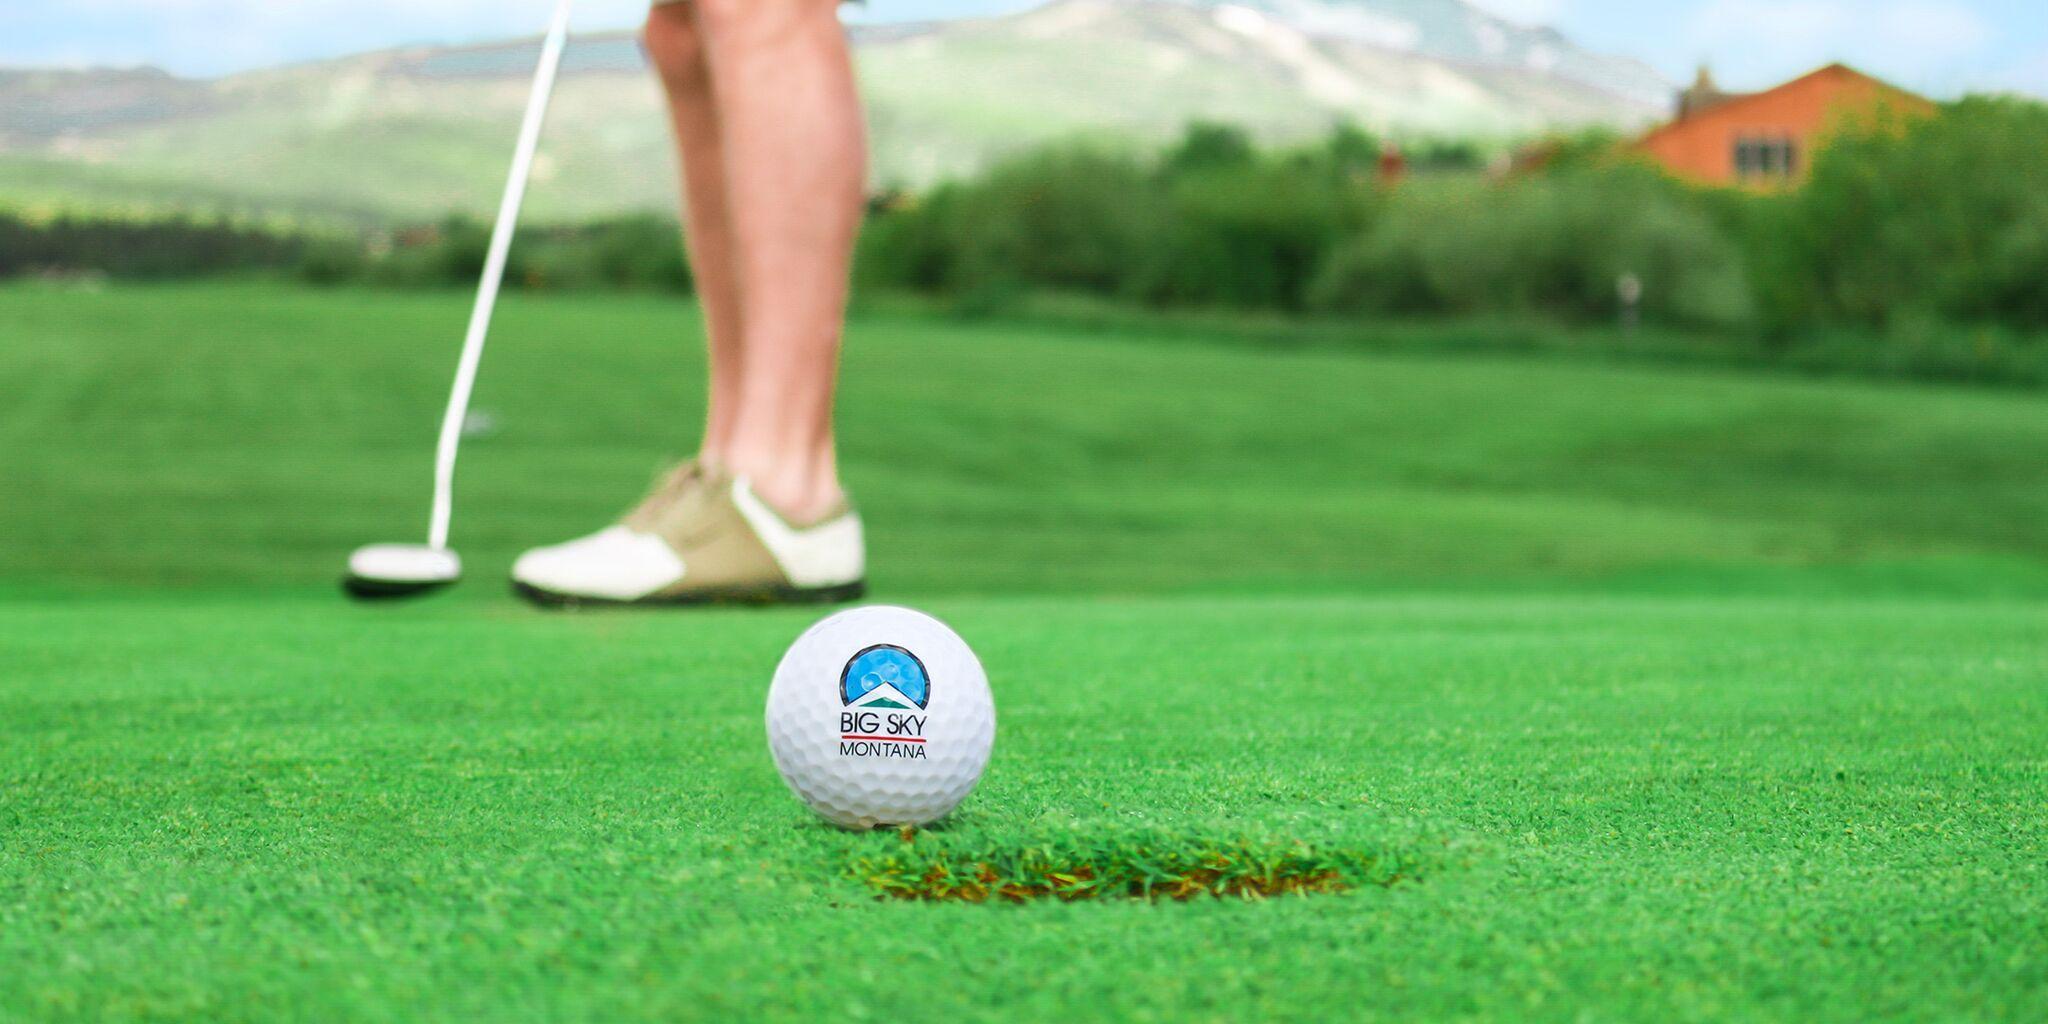 Big Sky Golf Course - 2018 Summer Tournaments